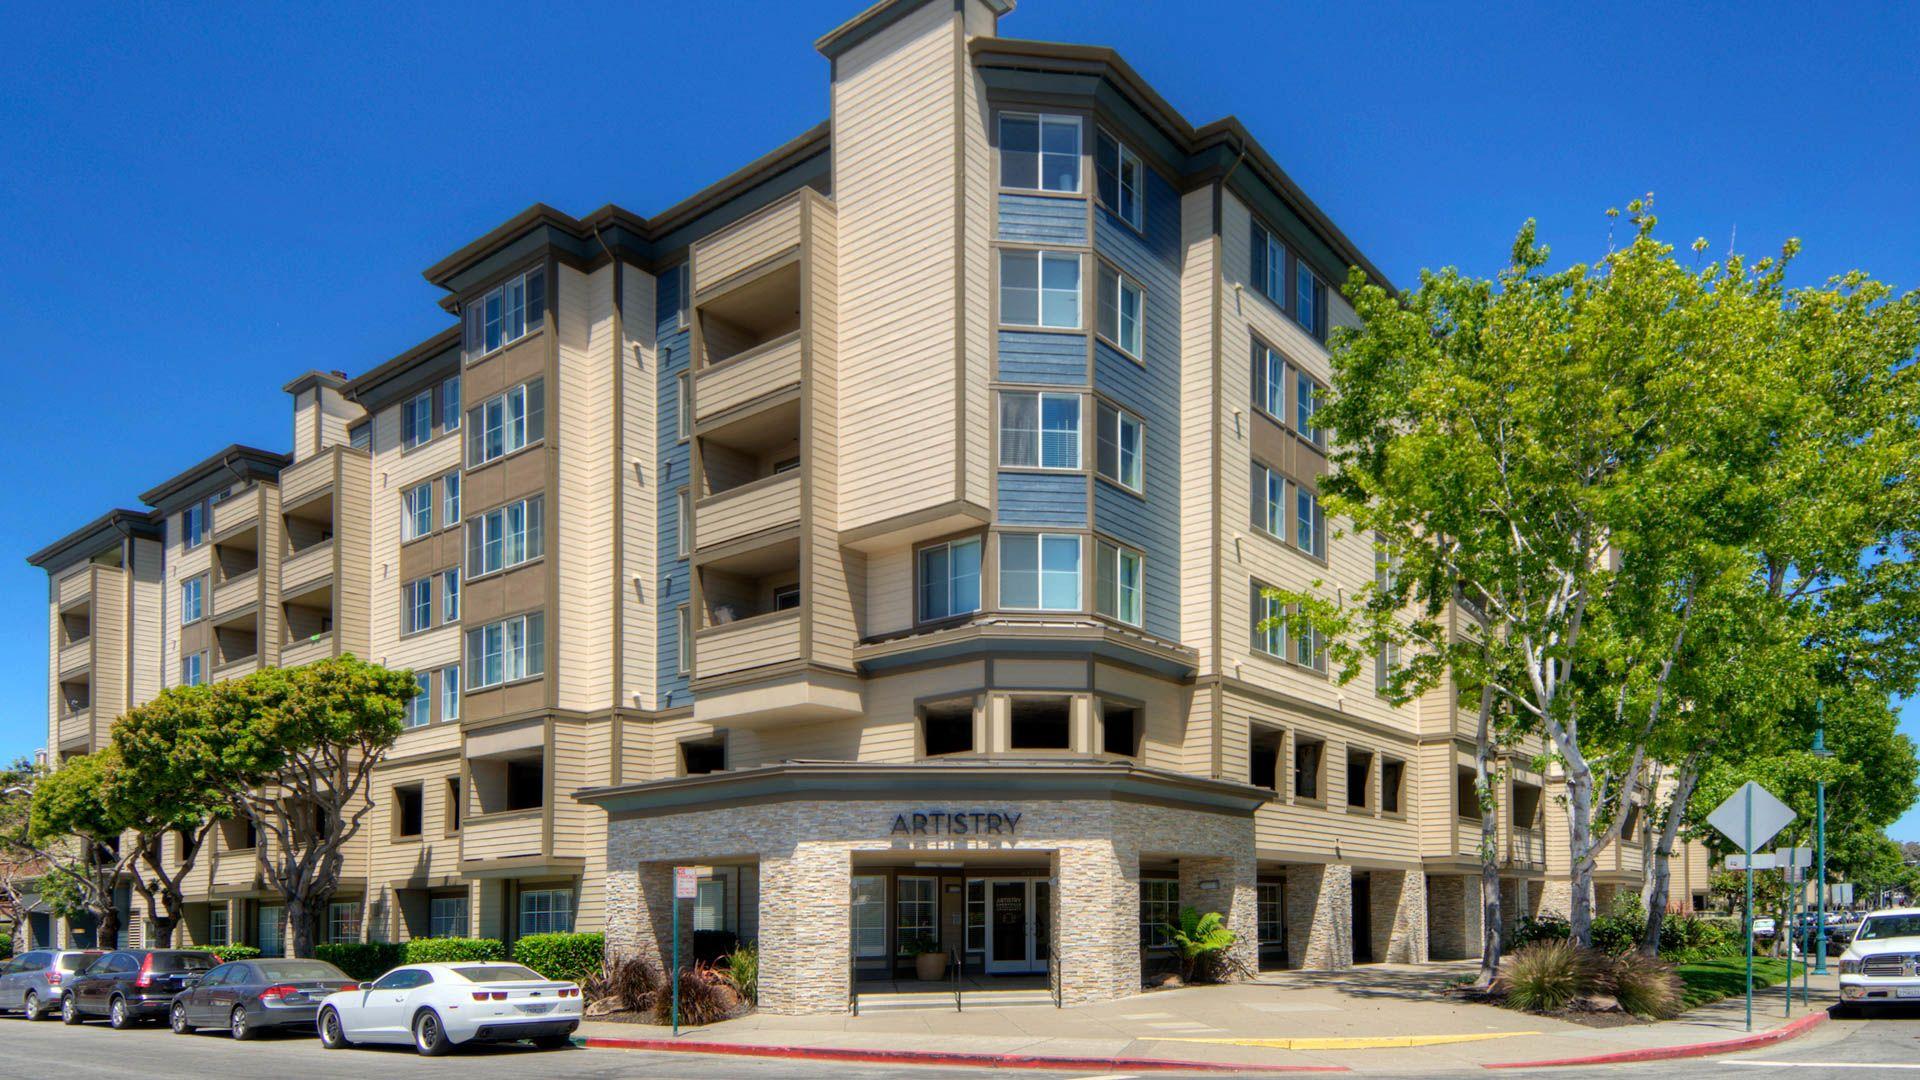 Artistry Emeryville Apartments - Exterior